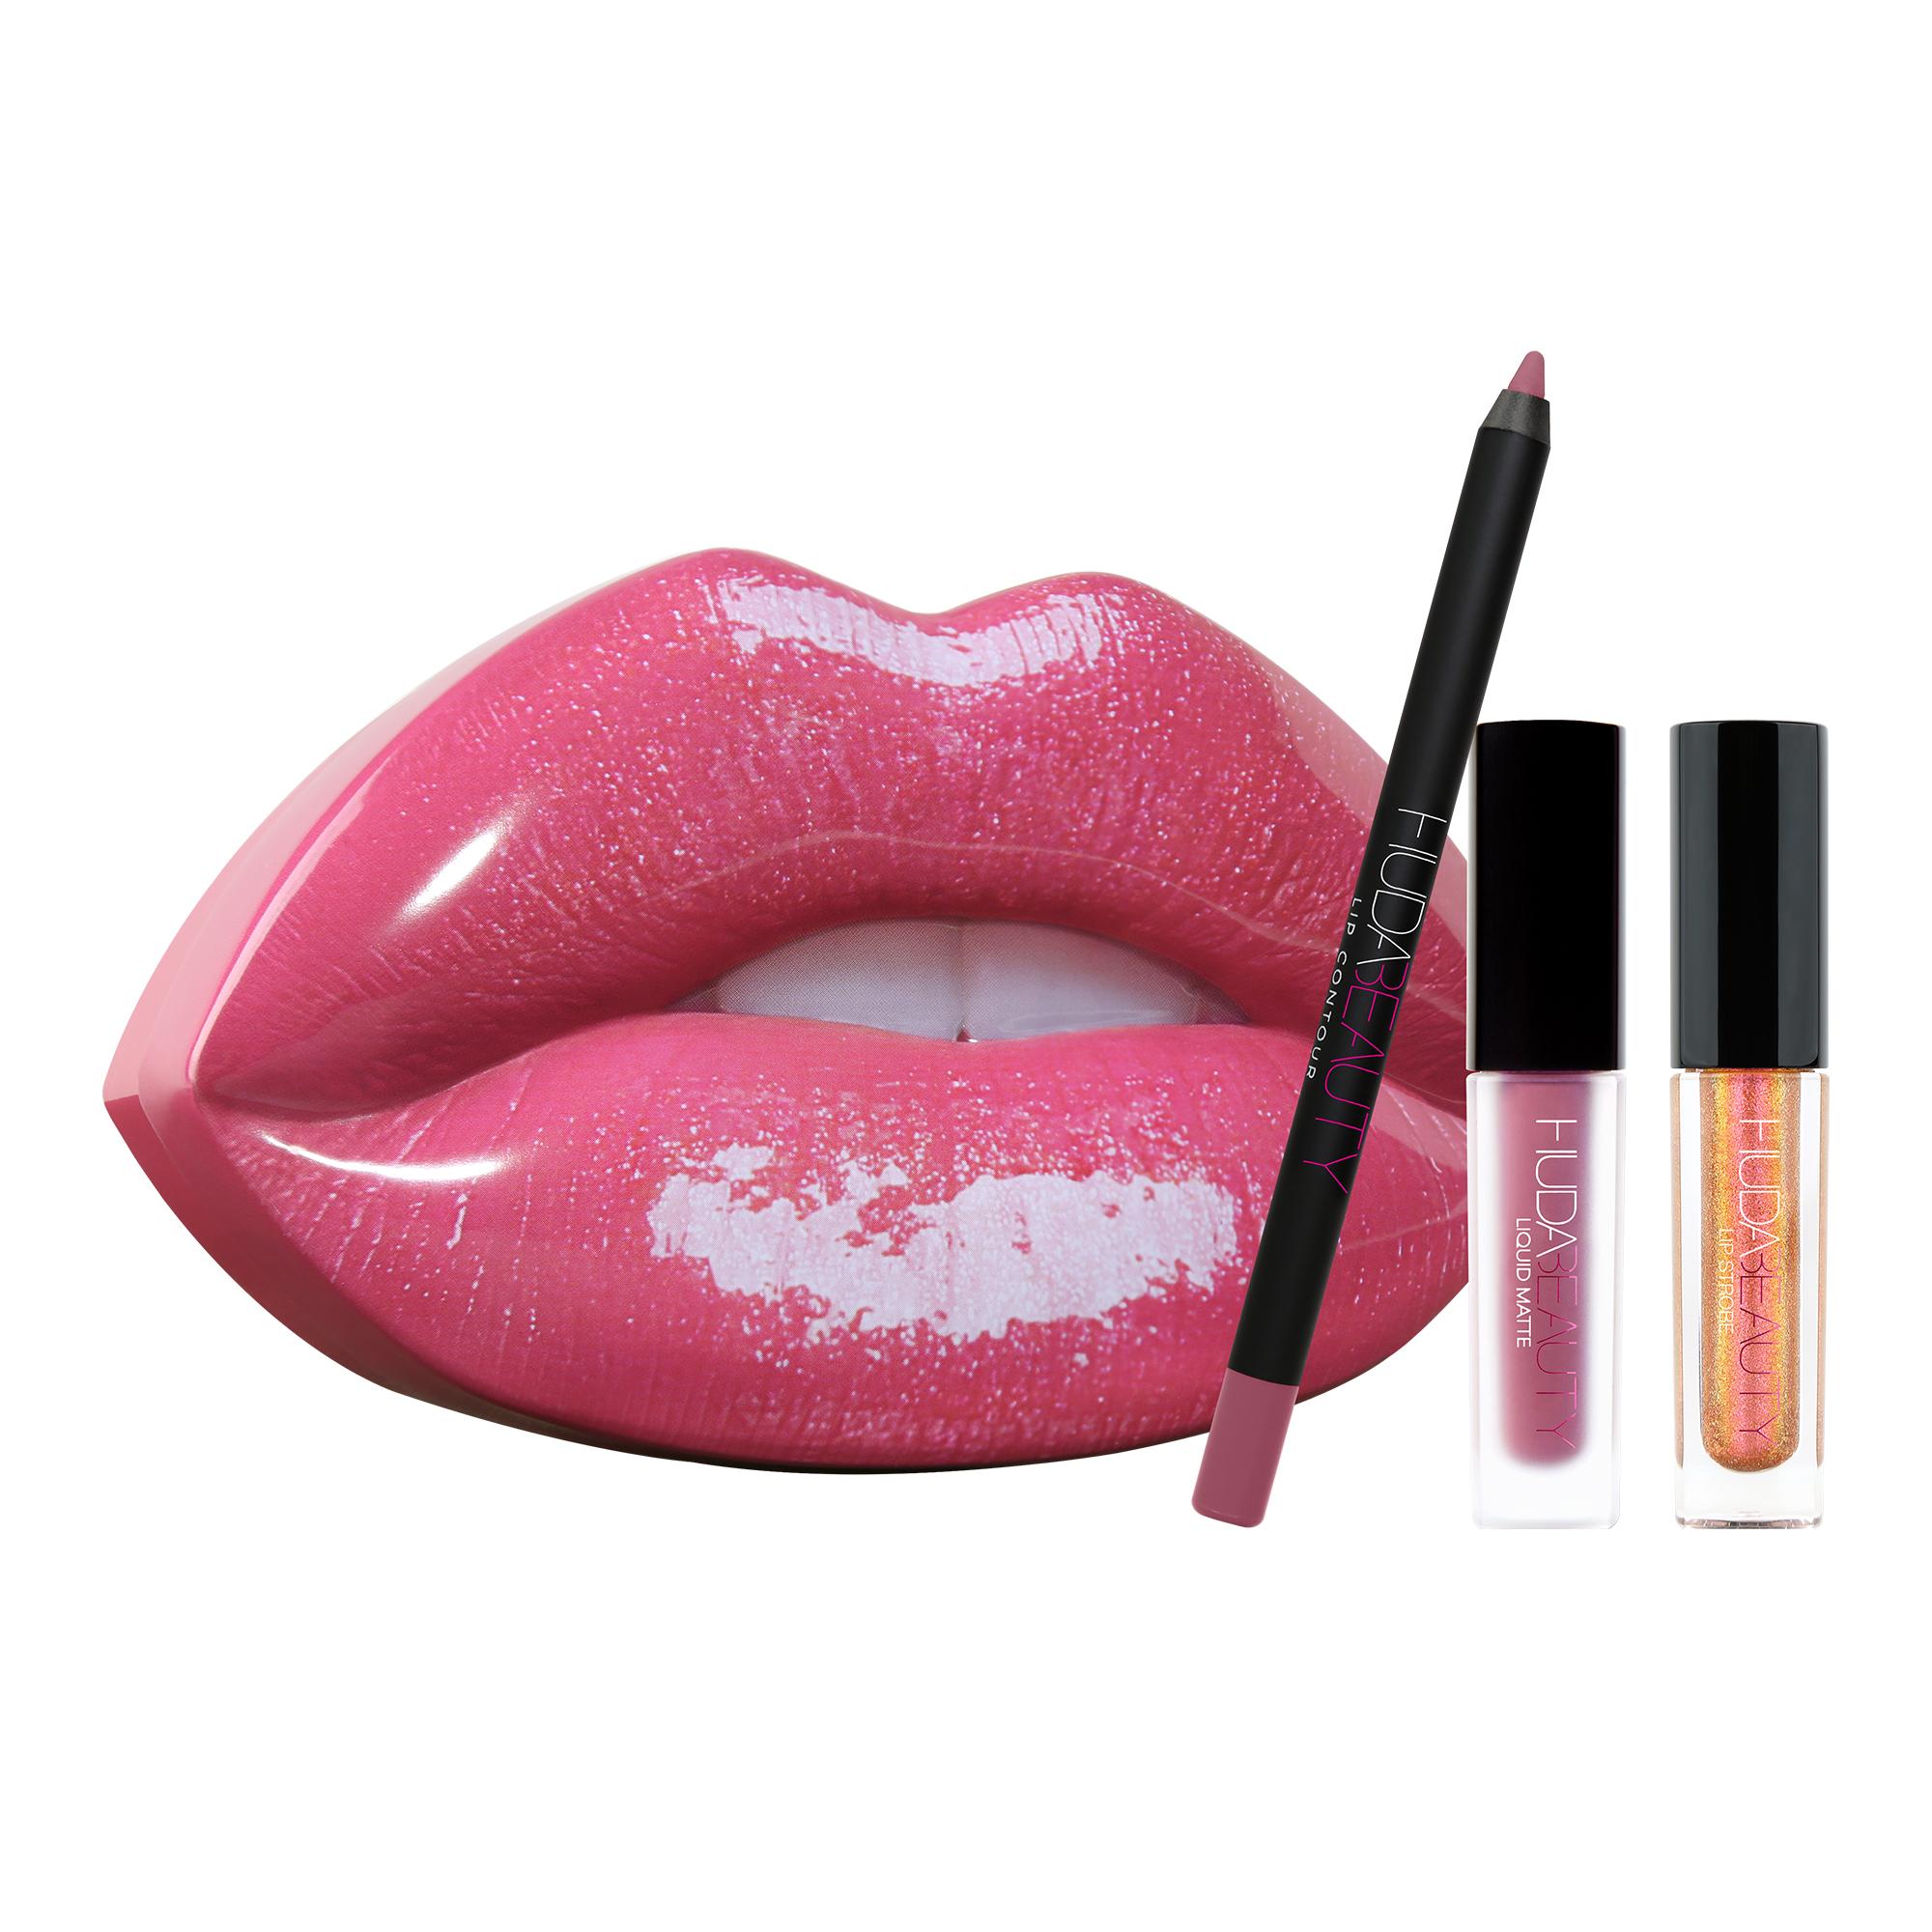 Top 10 Huda Beauty Lipstick Shades Price In Pakistan